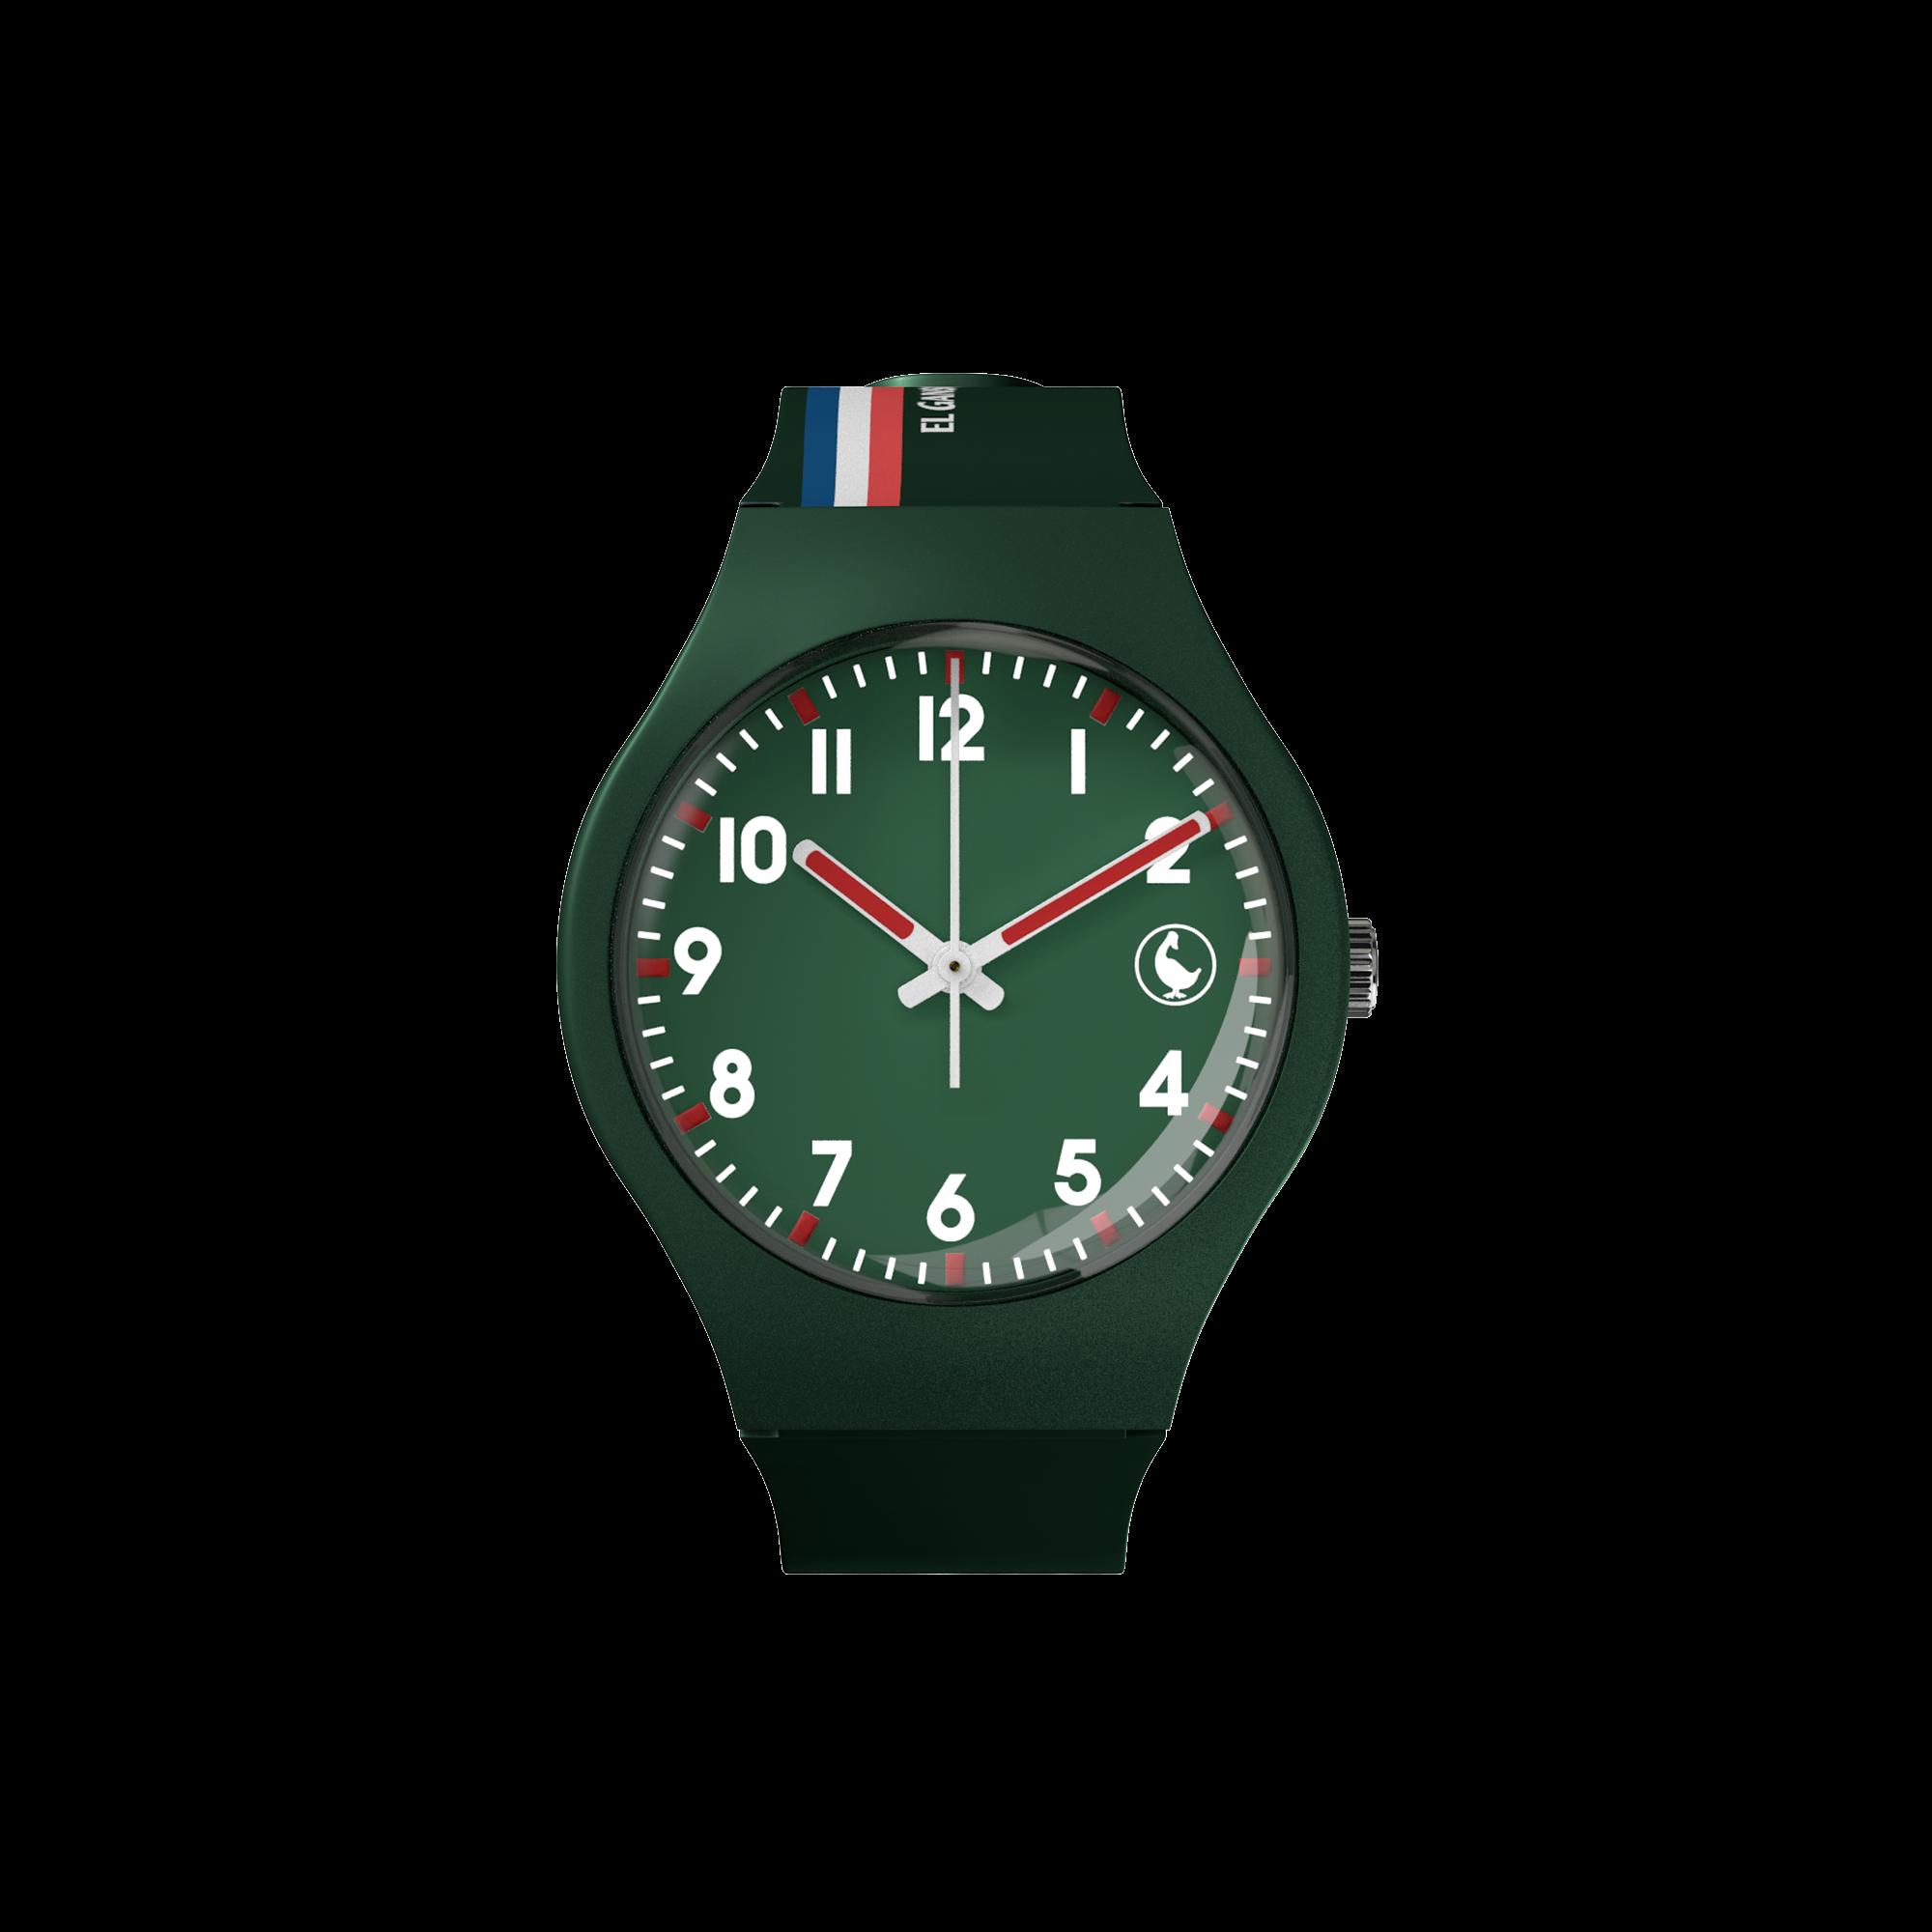 Reloj El Ganso Green Image 1